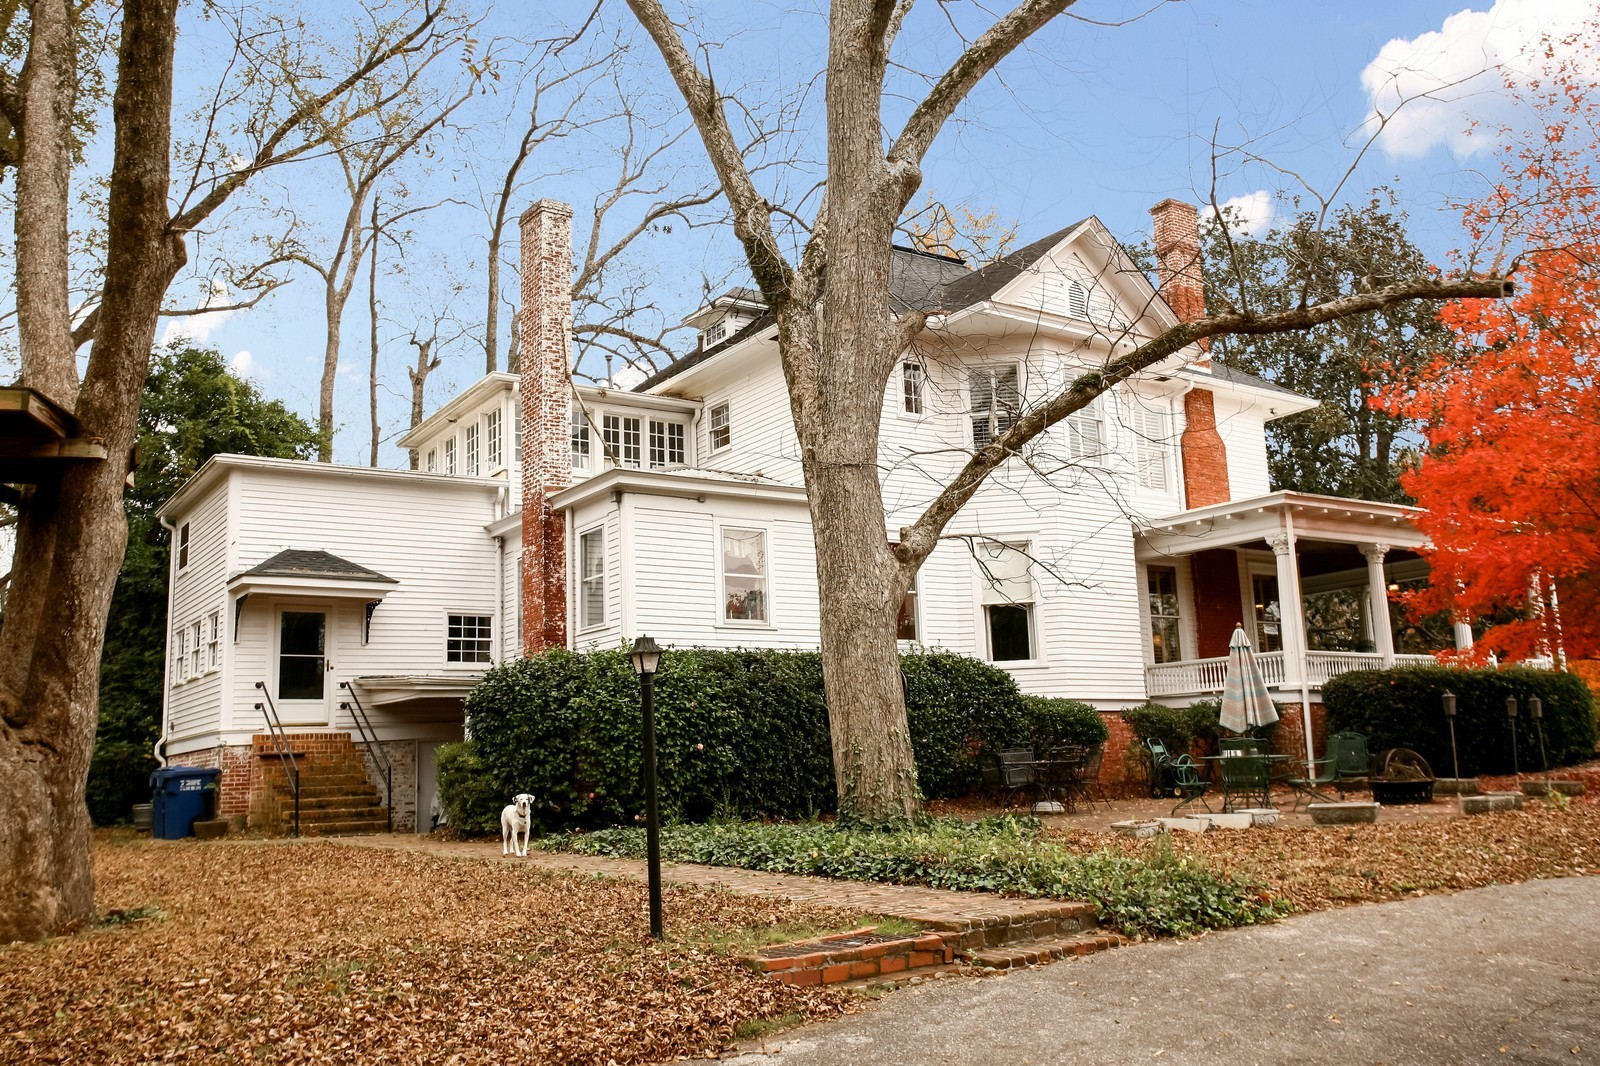 Real Estate Photography - 414 N 14th St, Lanett, AL, 36863 - Side Yard